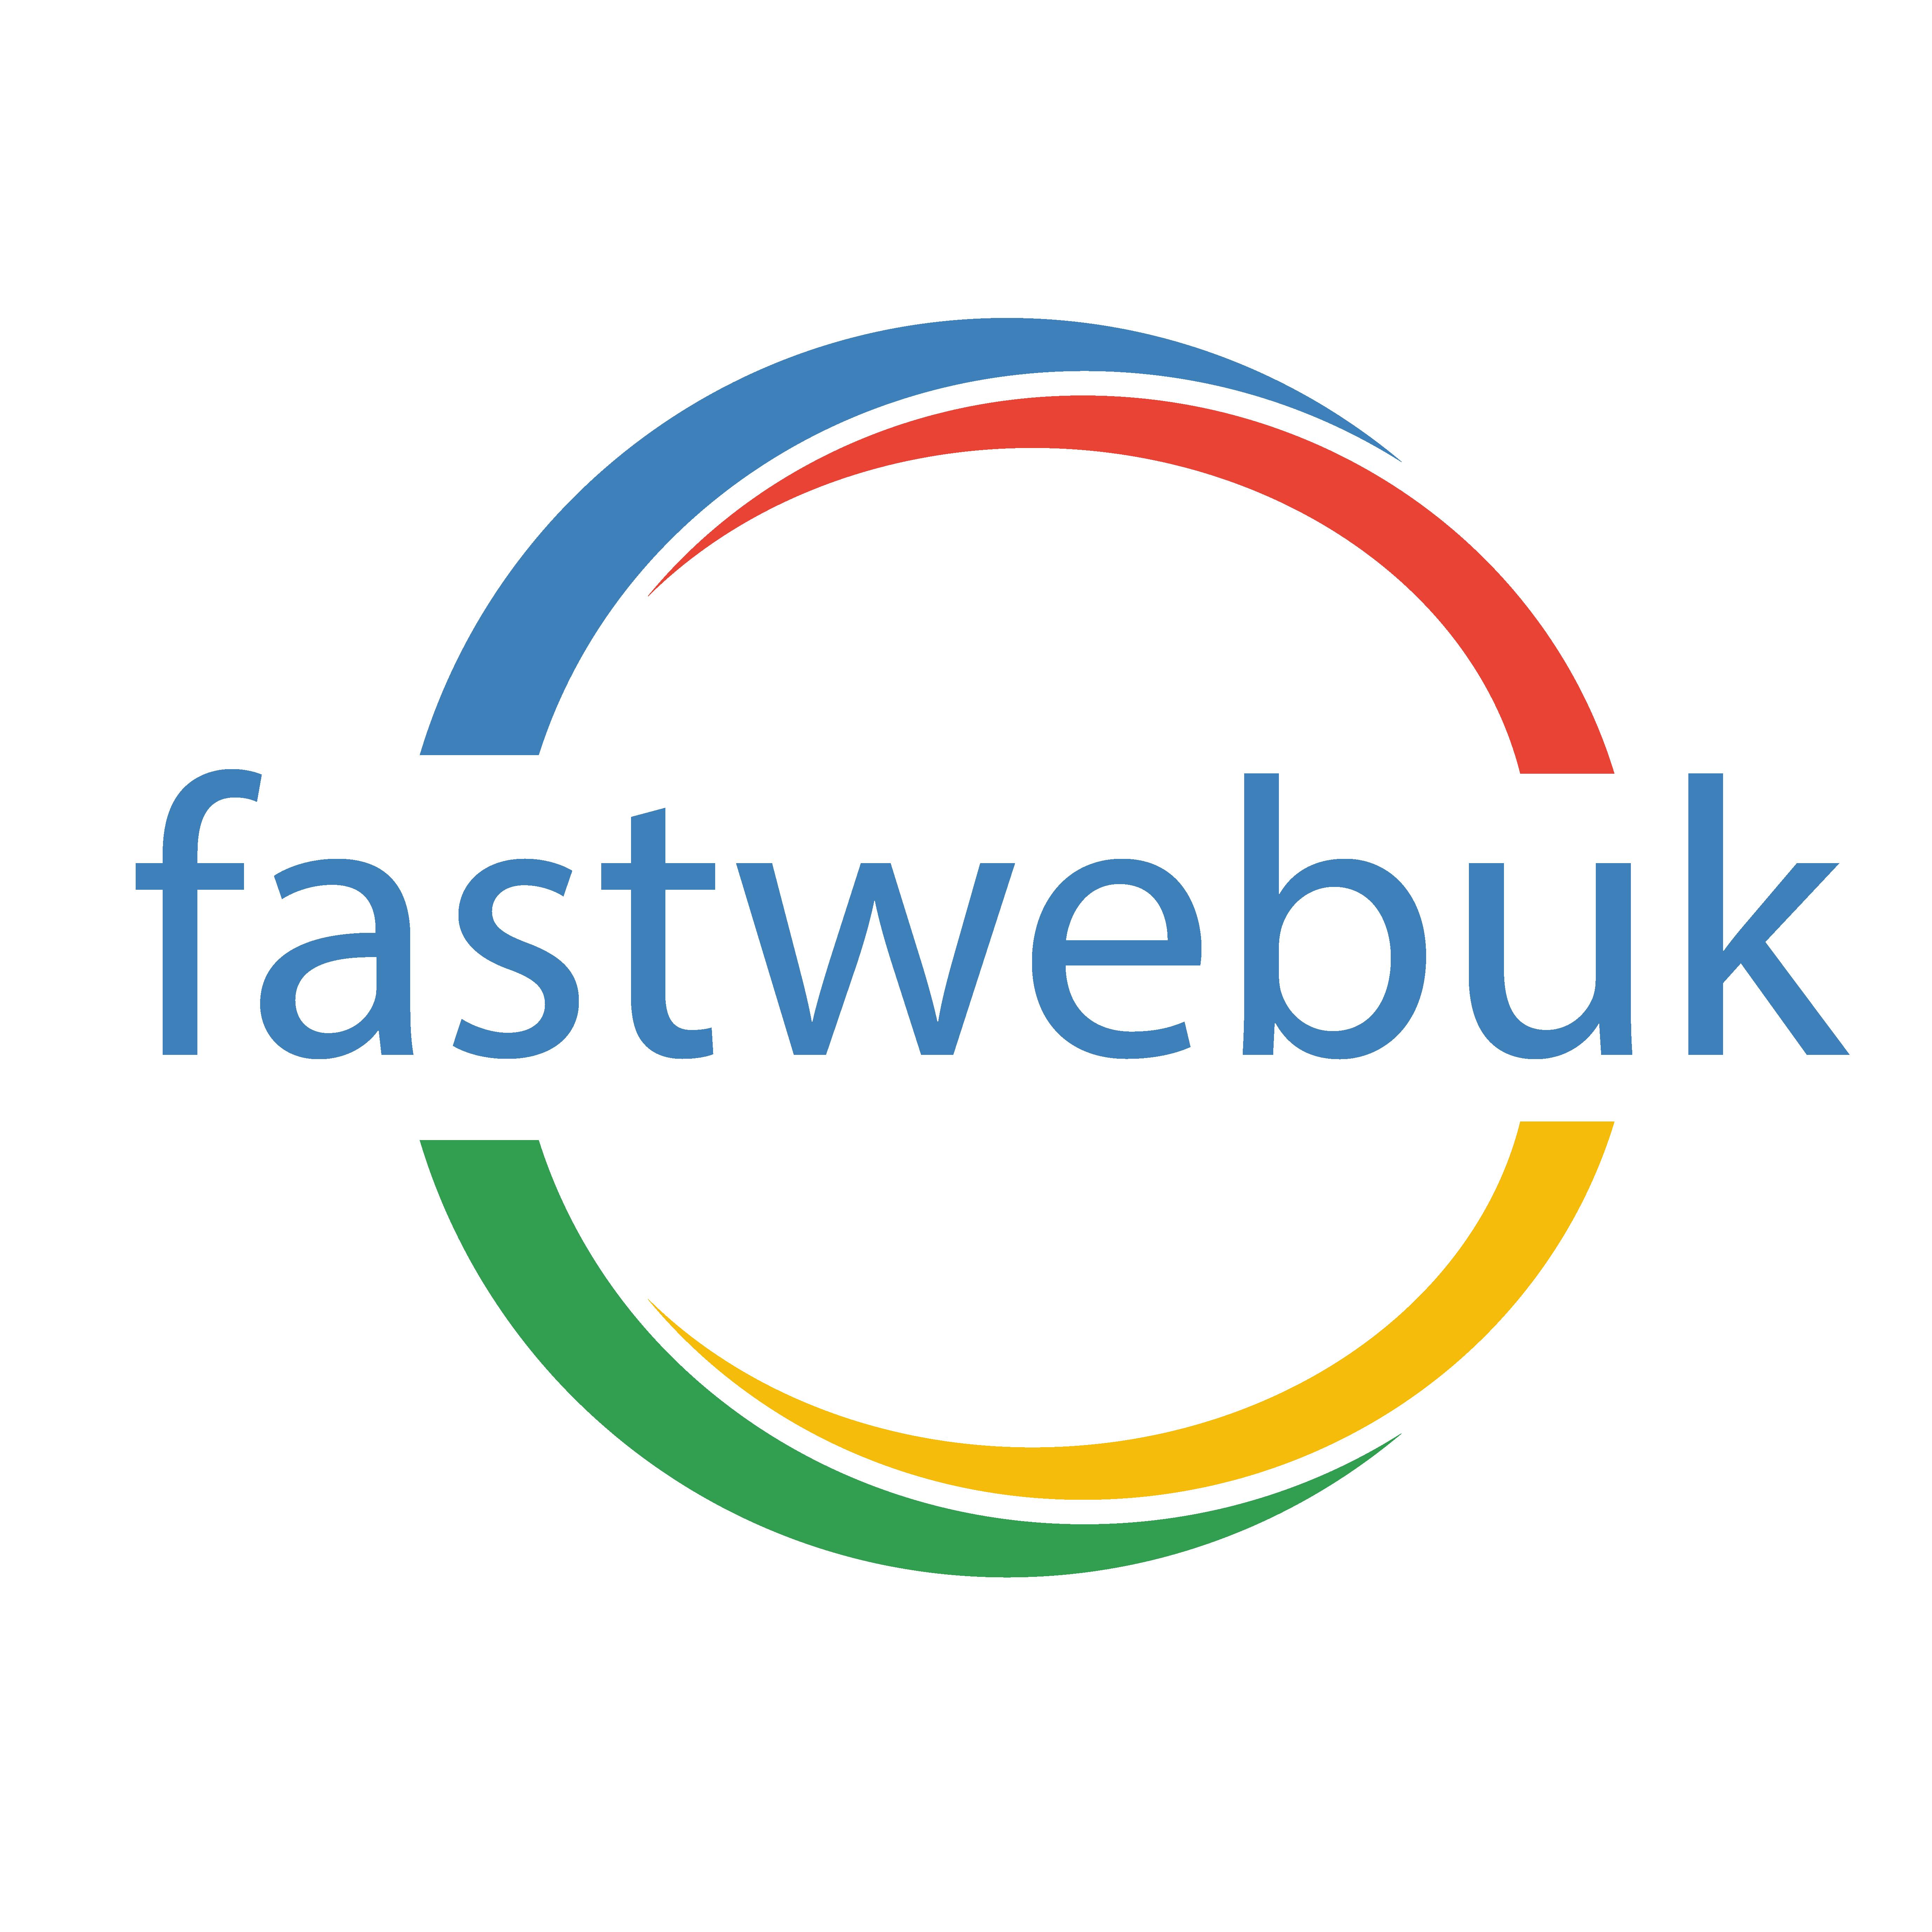 fastwebuk.com